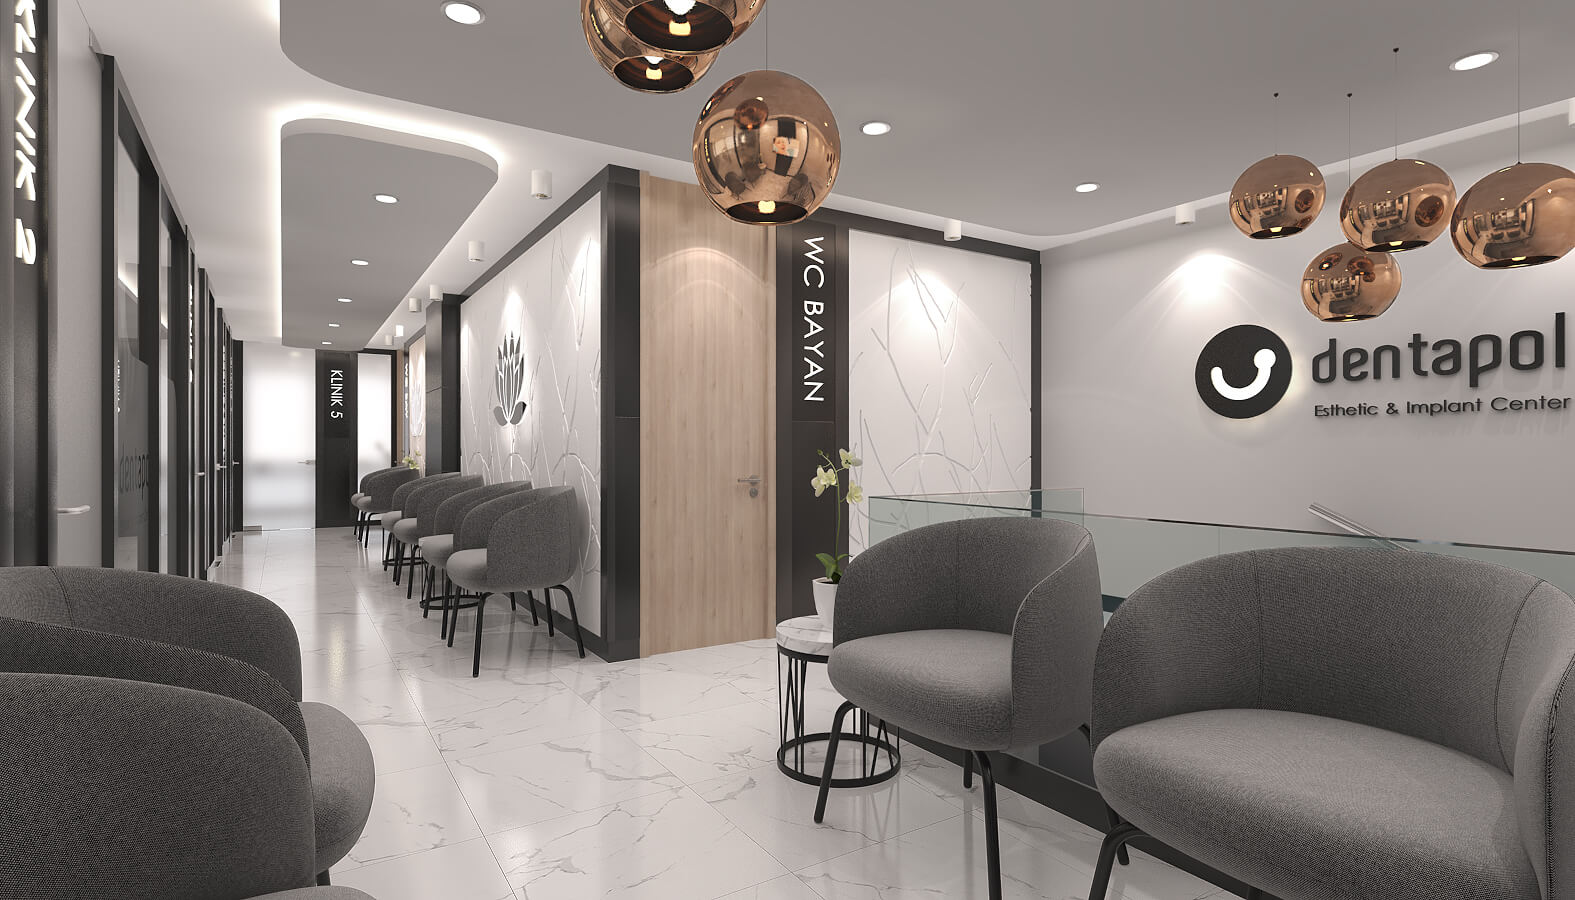 Ankara 4577 Dentapol Dental Polyclinic Healthcare